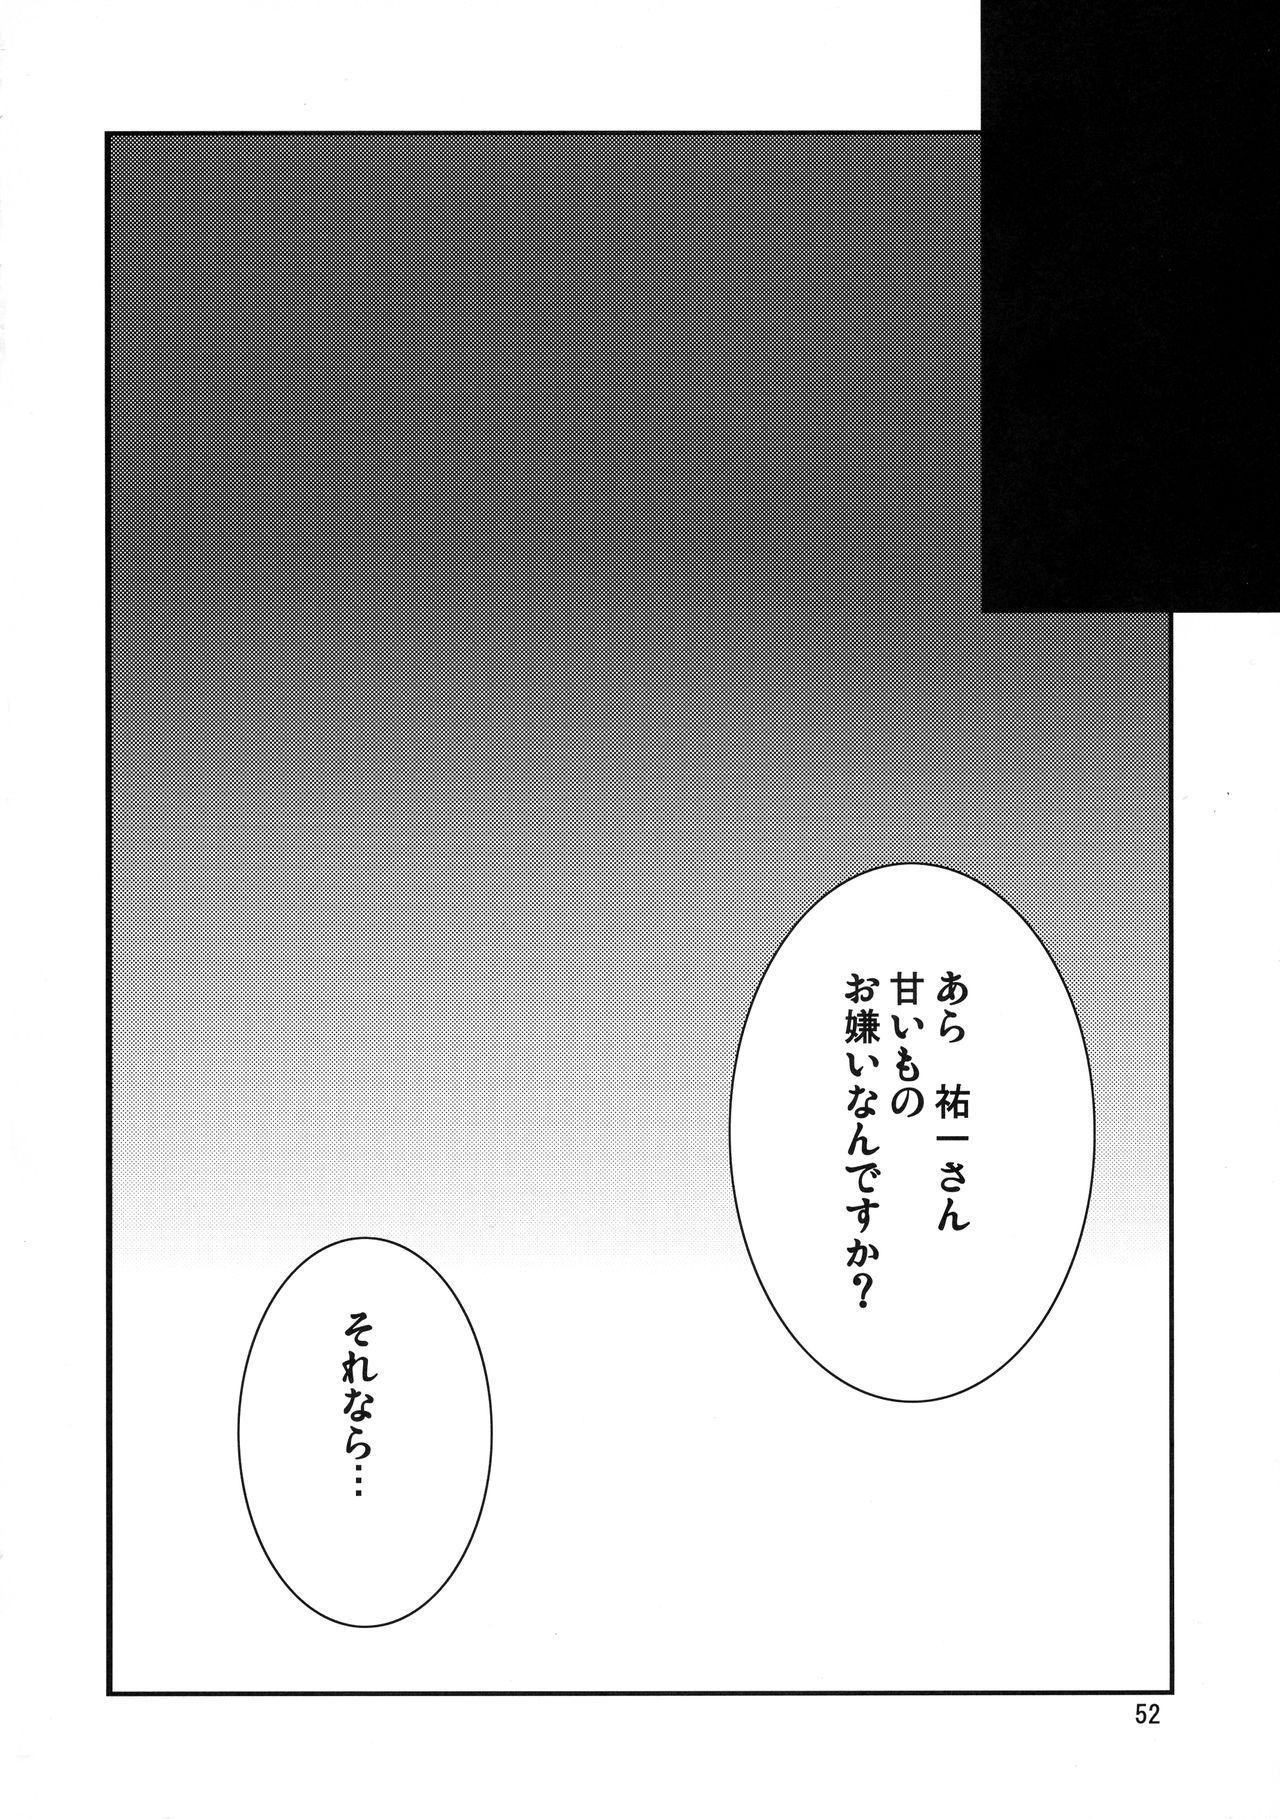 Kyouki Vol. 3~5 Remake Ver. 51